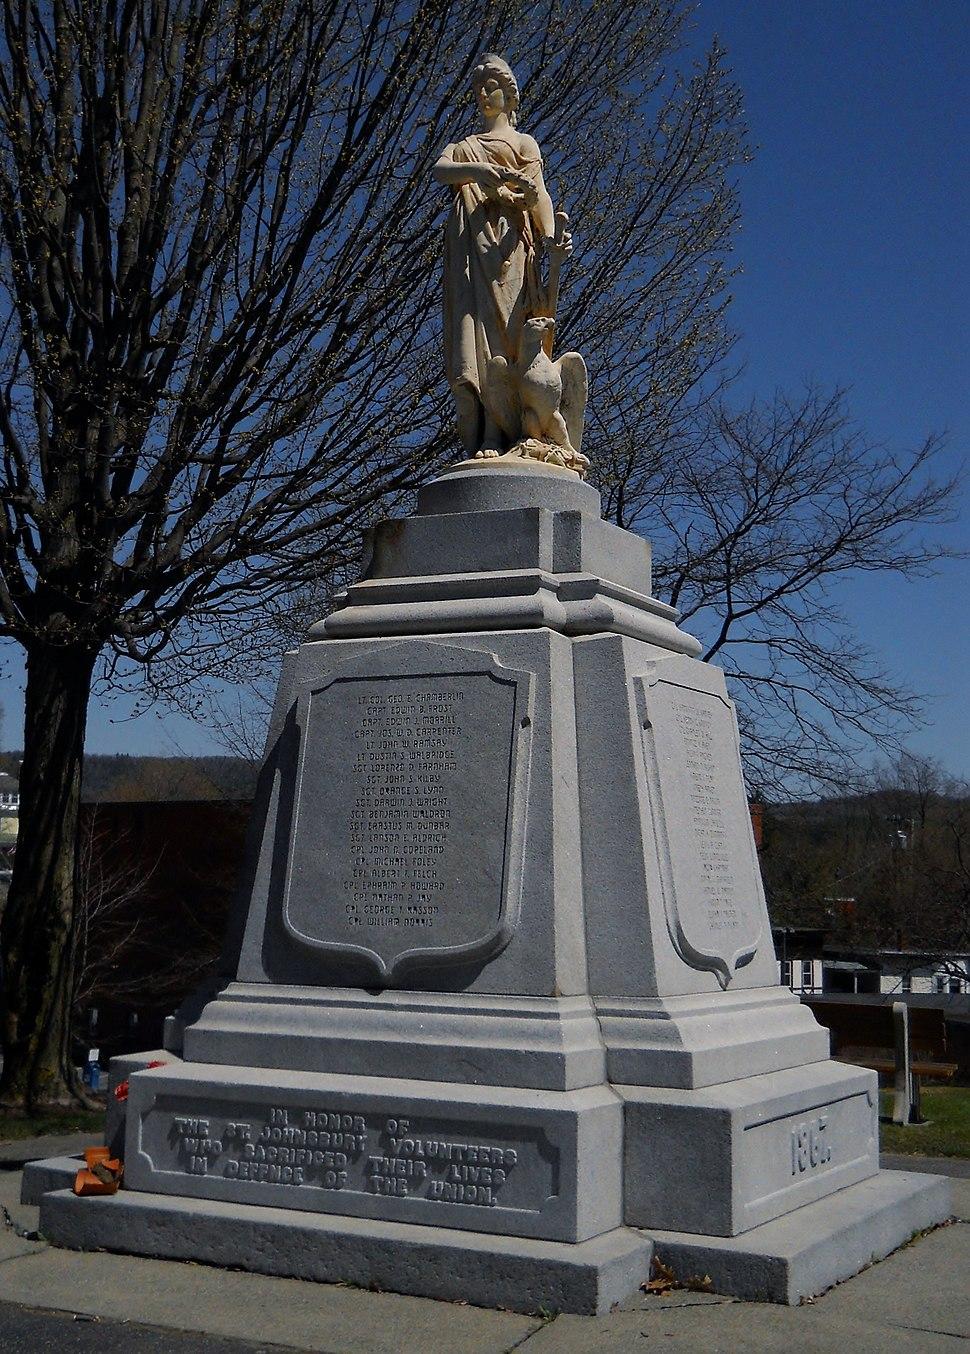 St Johnsbury Monument